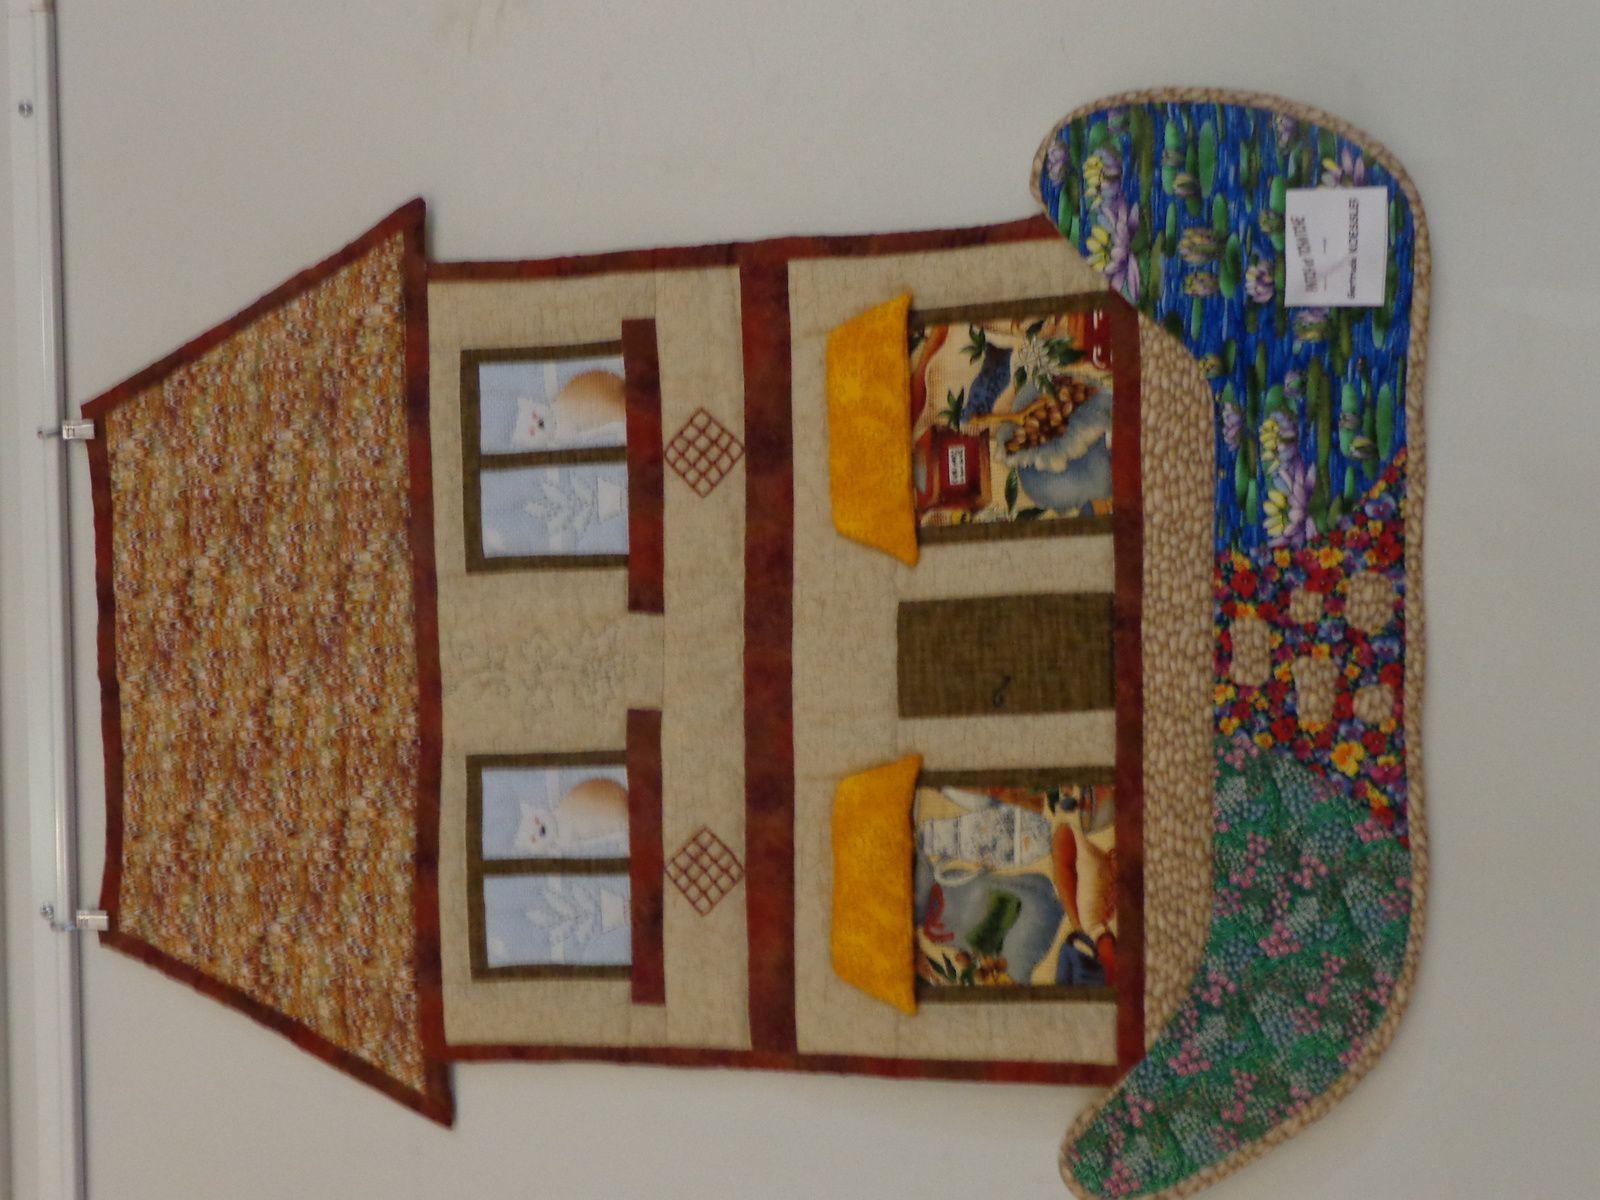 Exposition de patchwork à Béblenheim